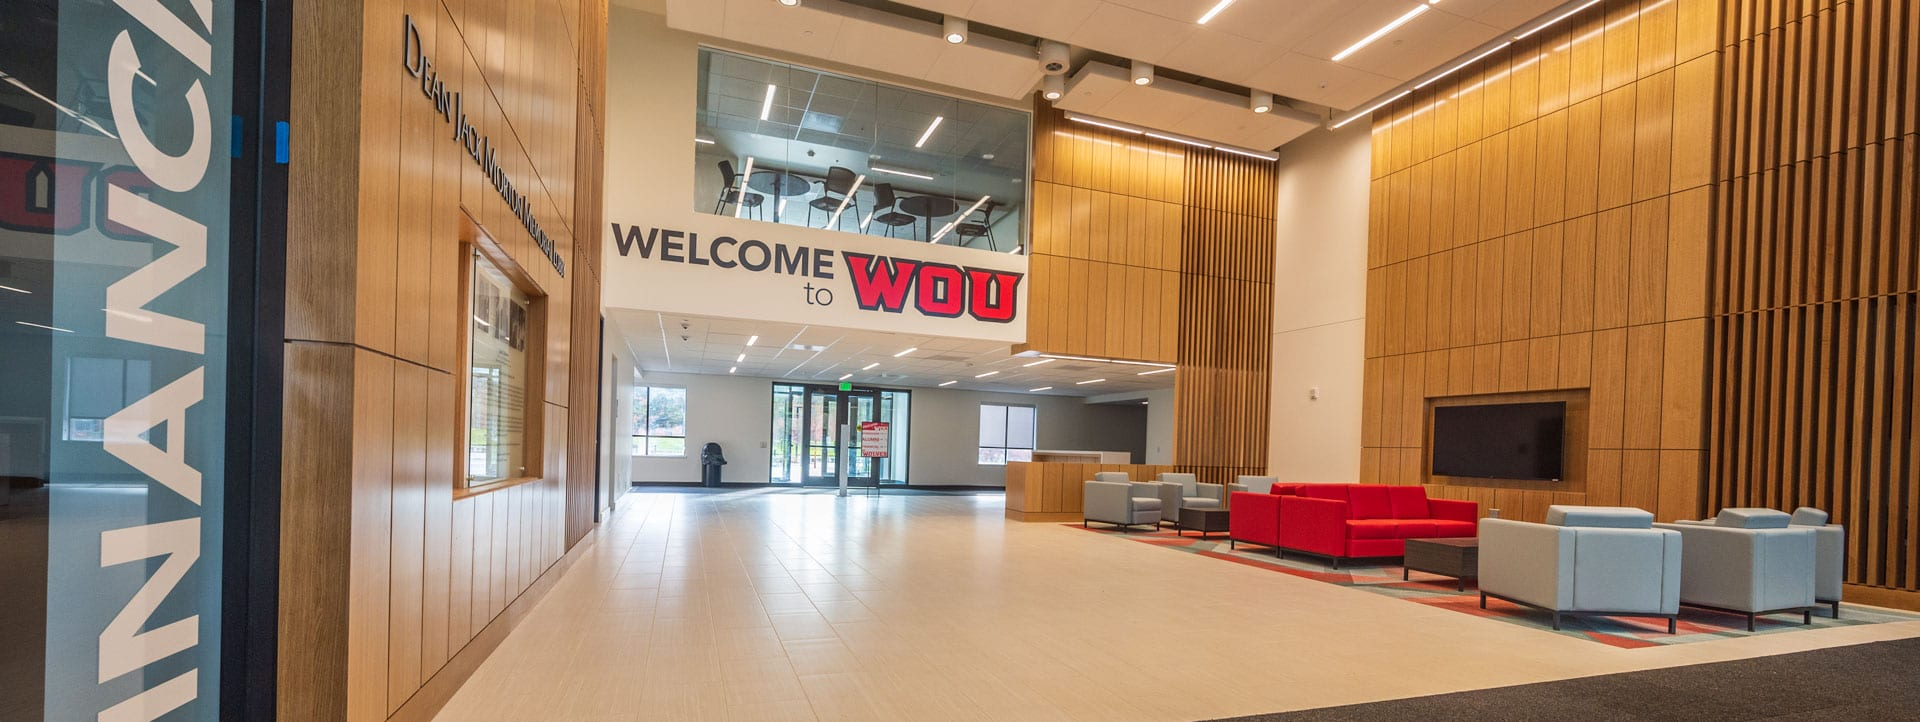 Western Oregon University Welcome Center